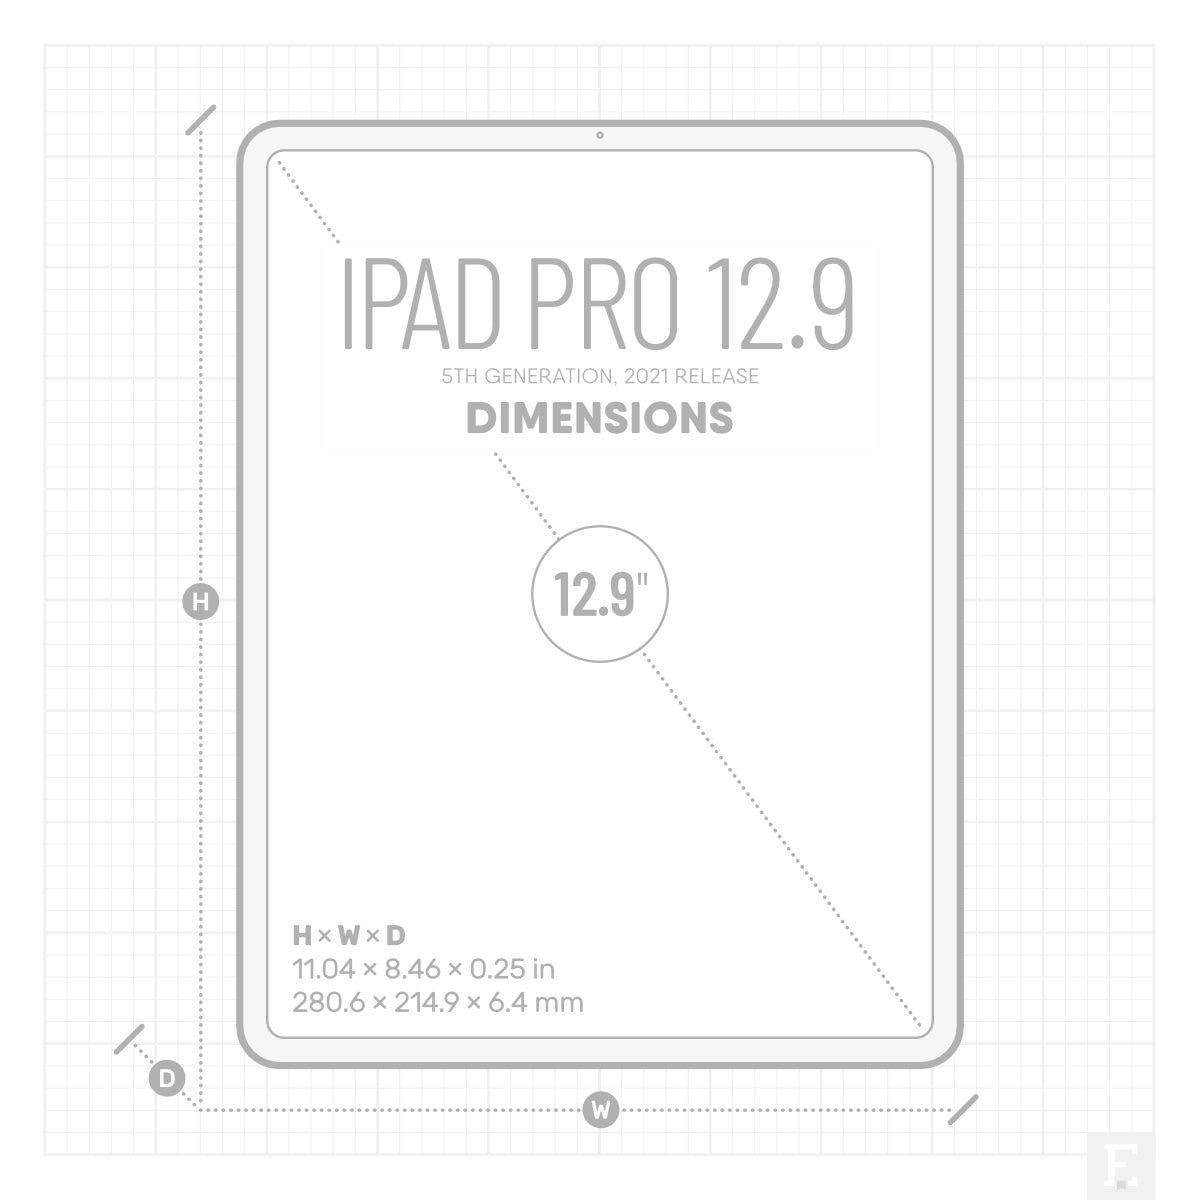 Apple iPad Pro 12.9 2021 model dimensions size